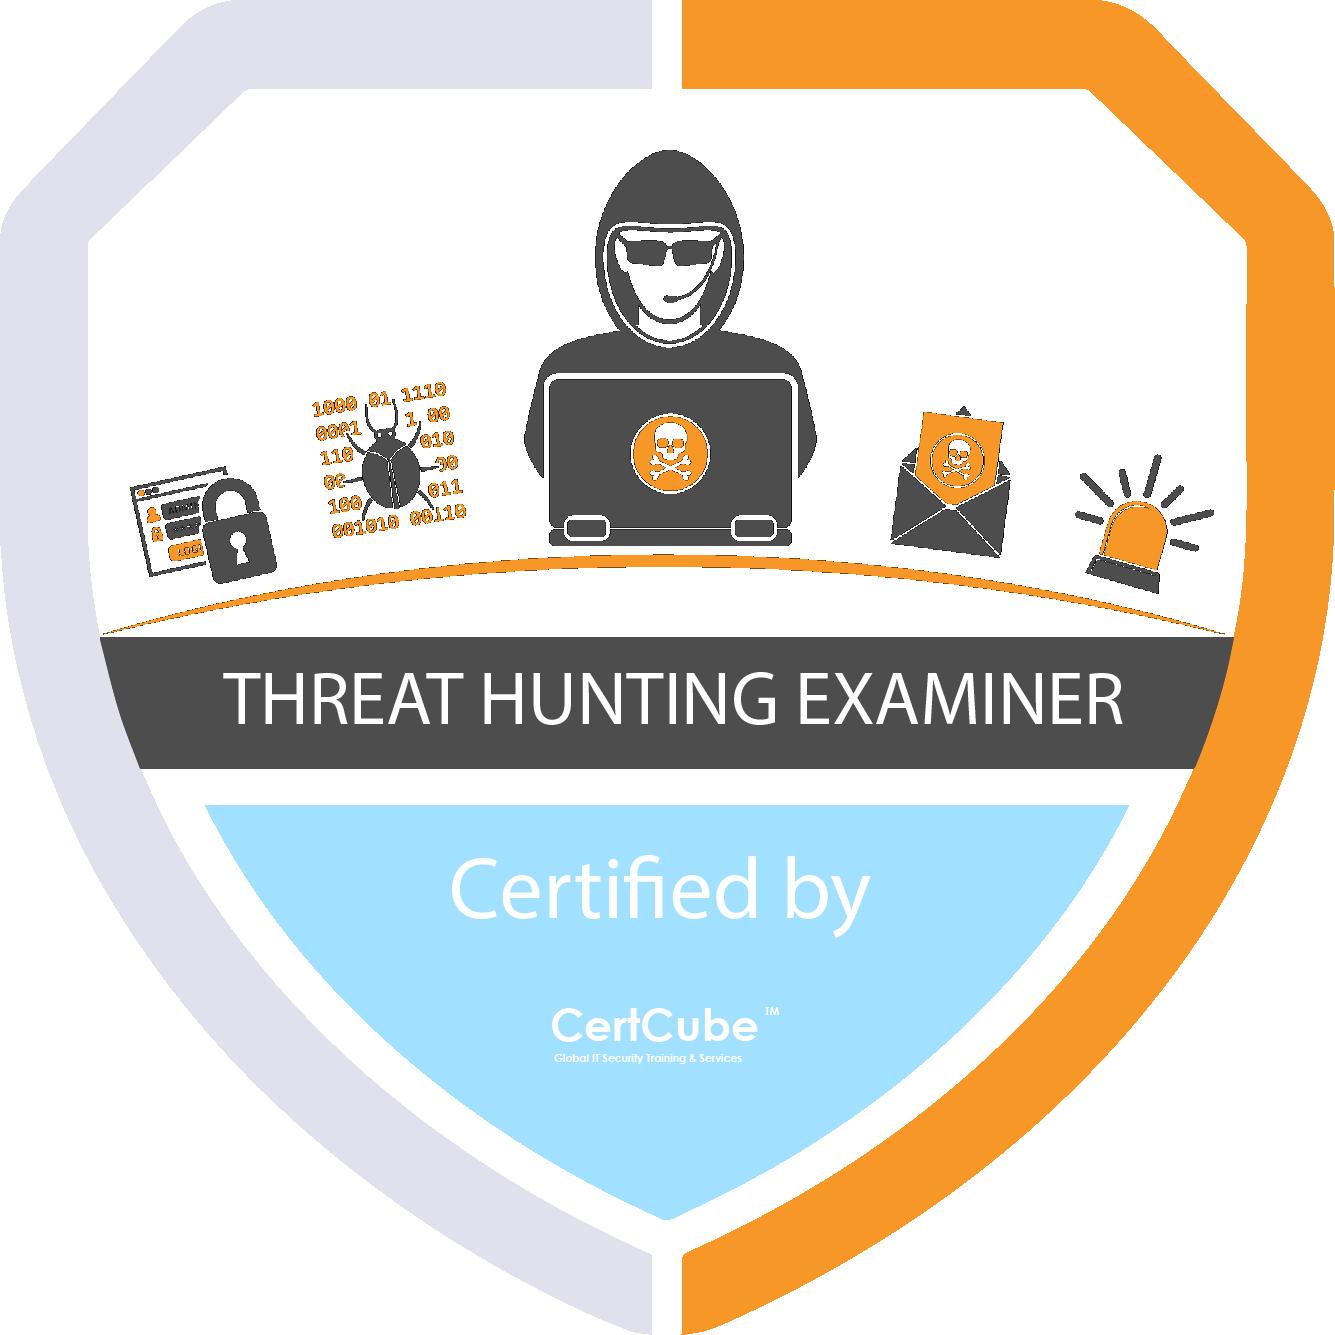 Threat hunting examiner